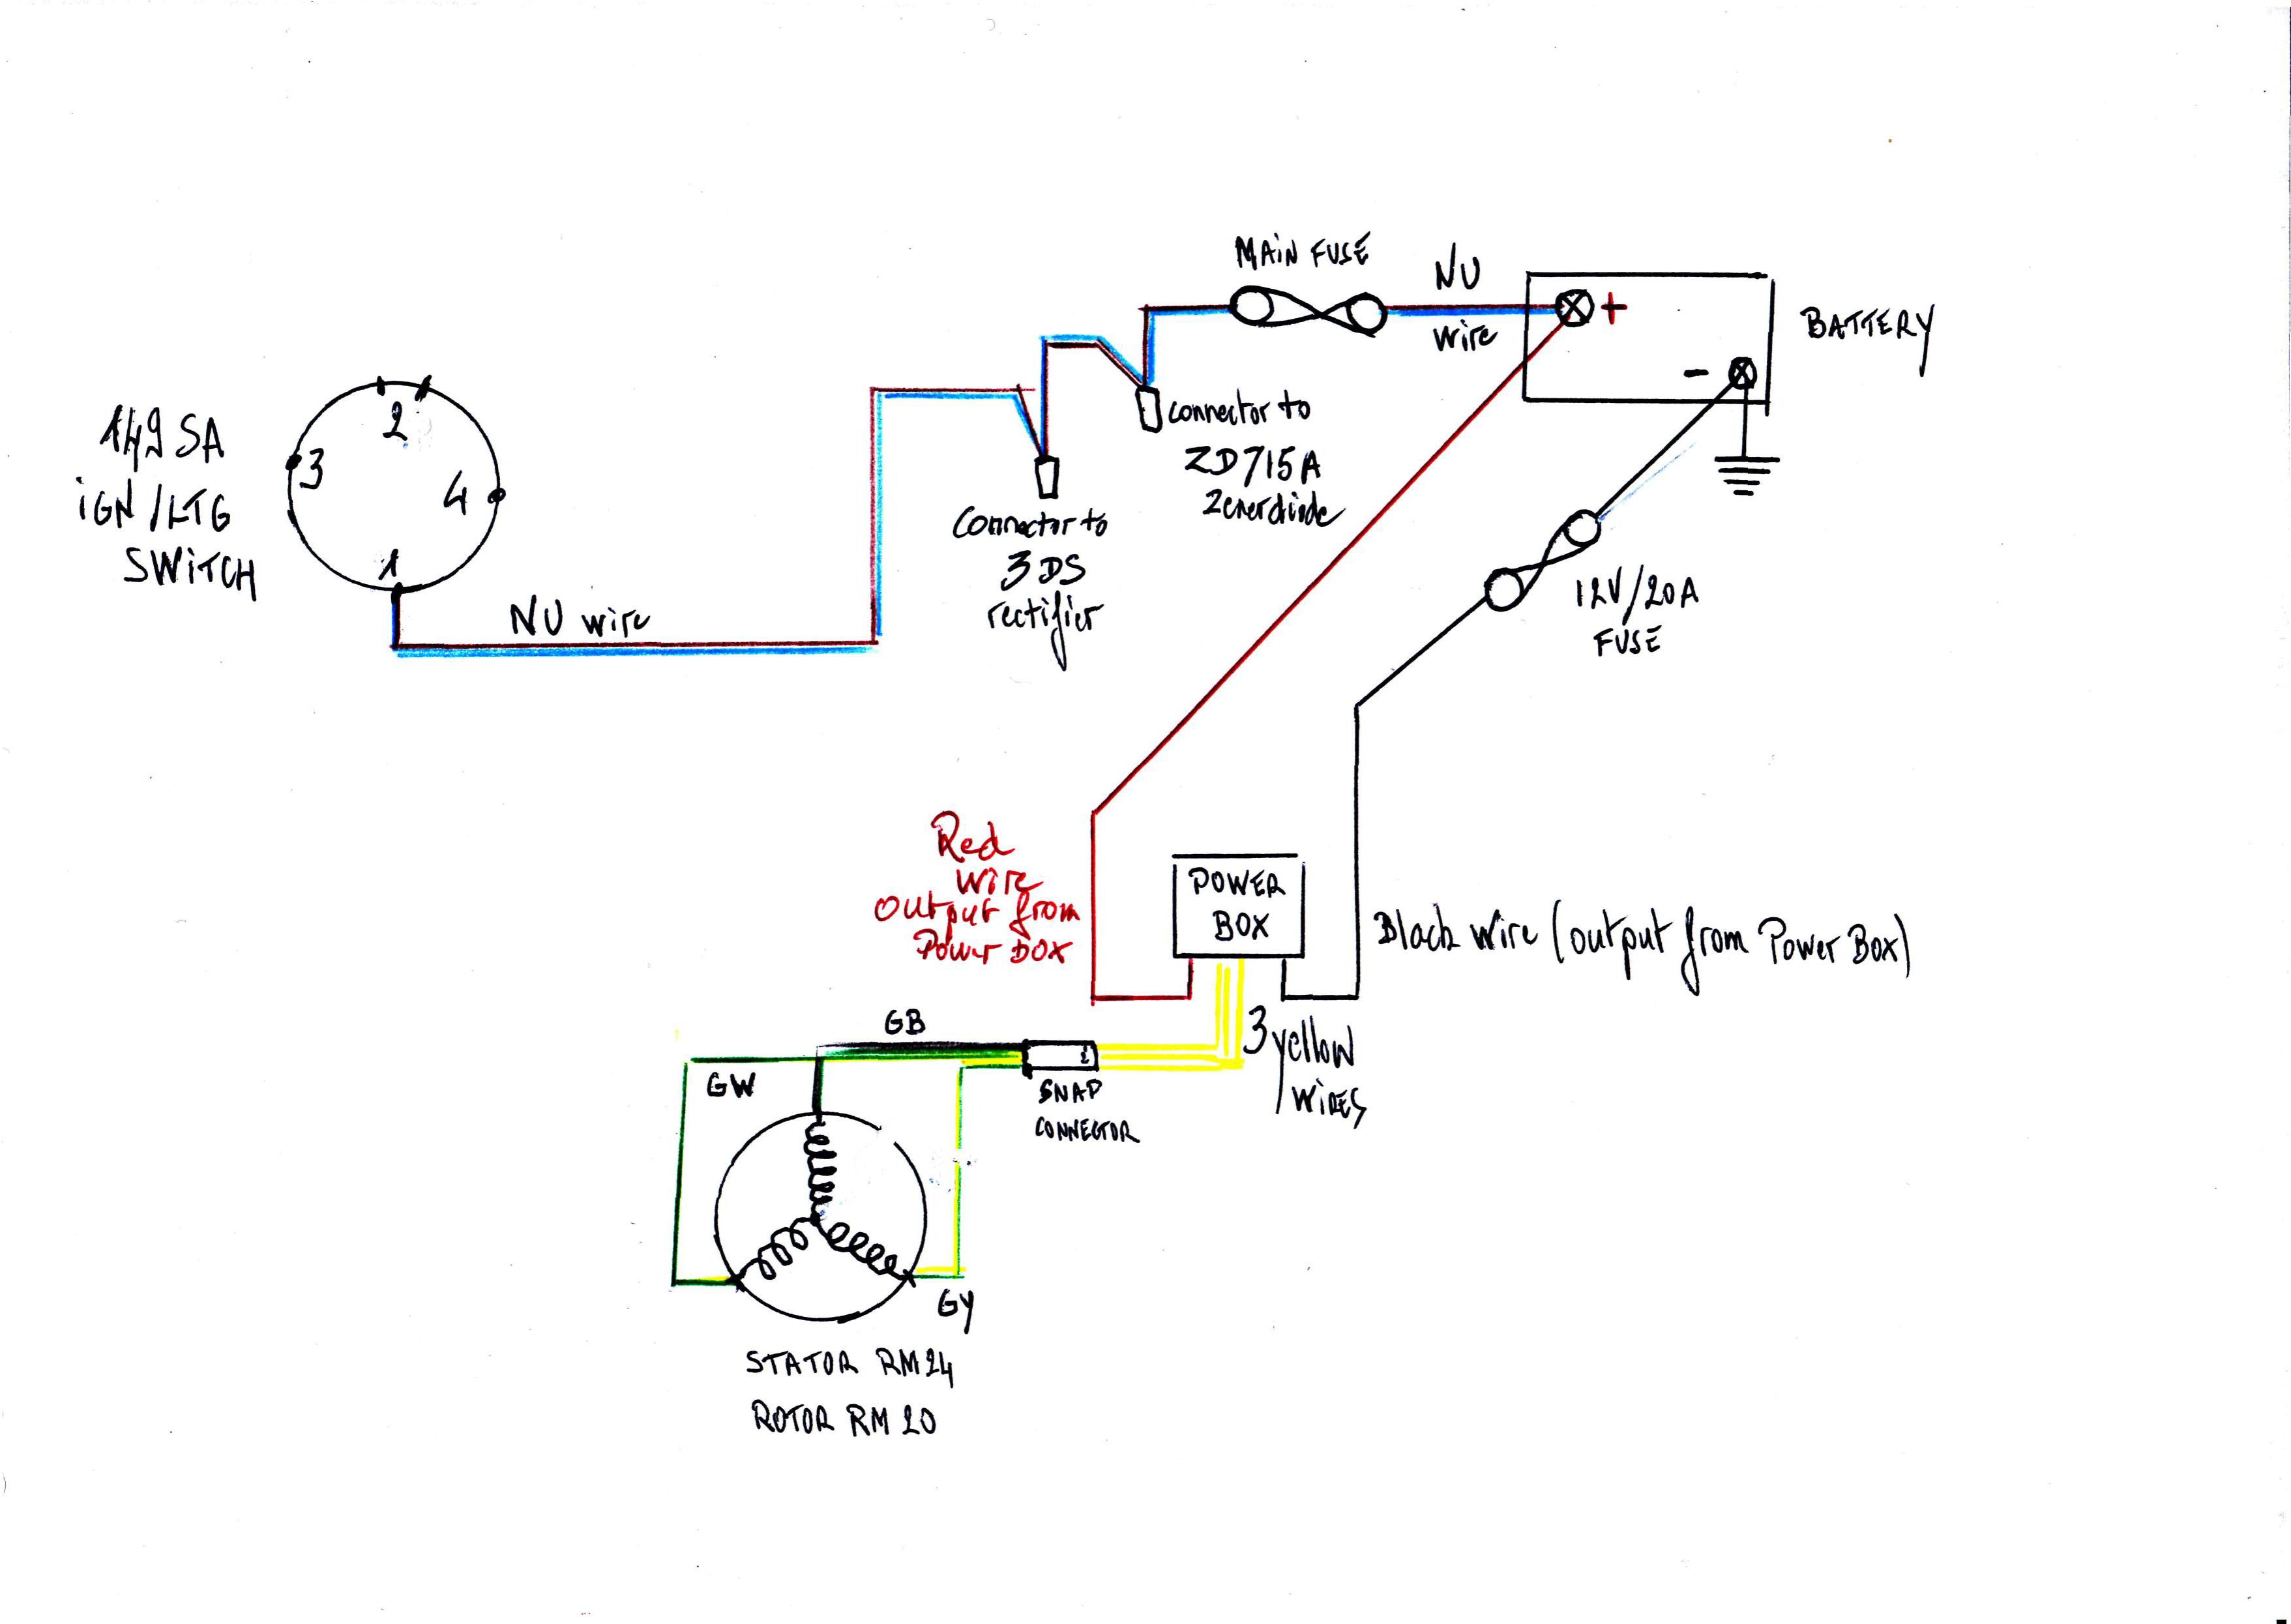 Wiring A Power Box On A T140e  Help Please